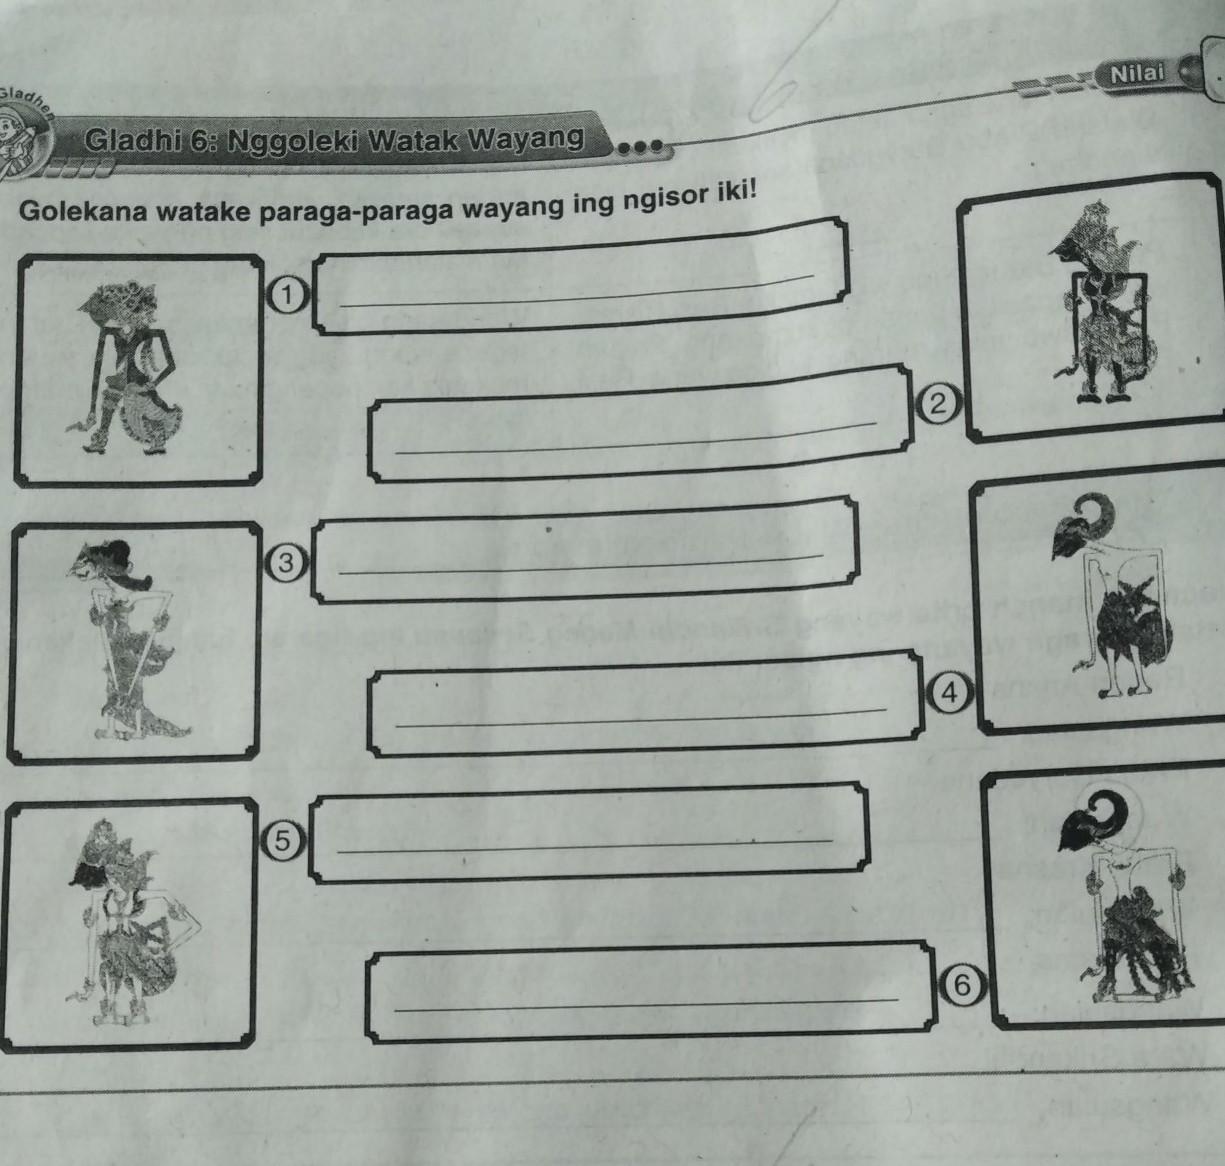 Di dalam bahasa jawa, kita juga mempelajari tentang kesenian khas daerah jawa, seperti pewayangan. Gambar Wayang Lan Jenenge Lan Gamane